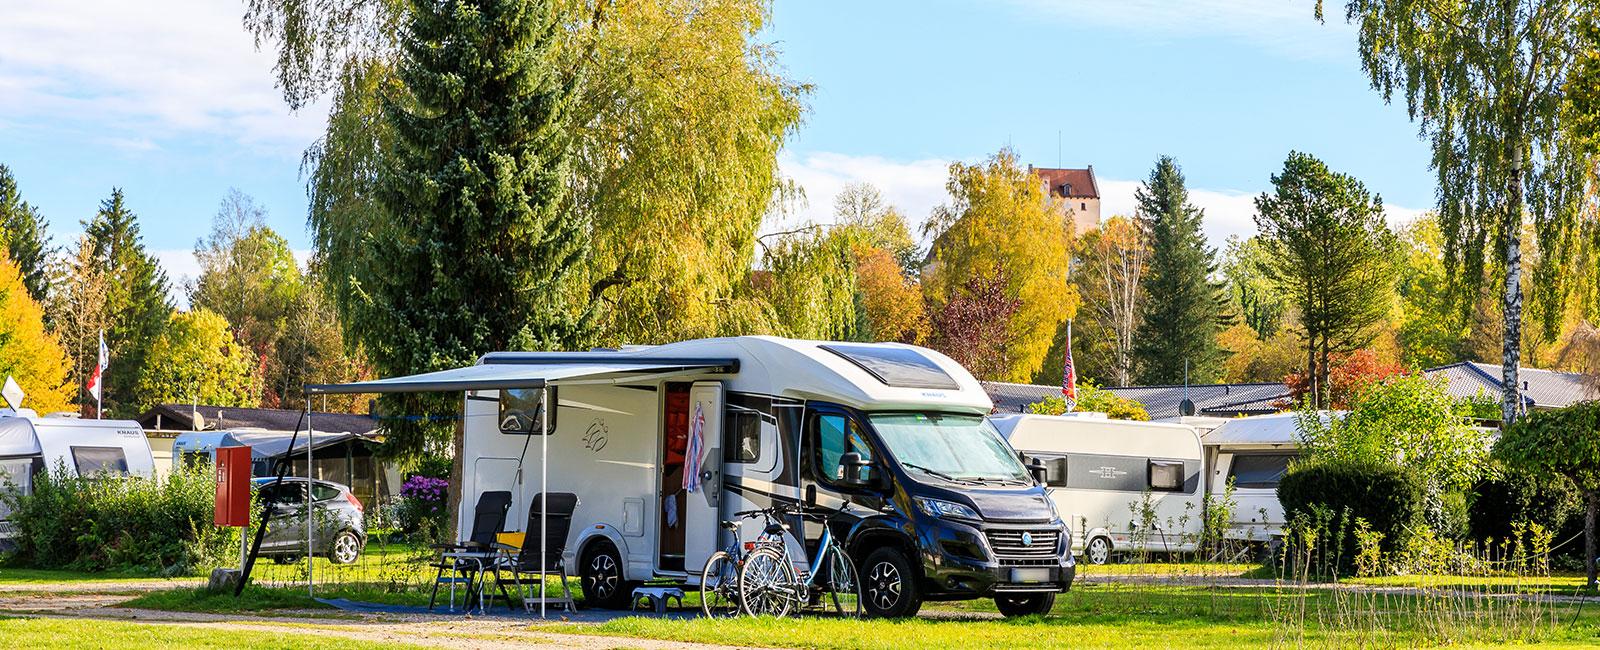 Wohnmobil auf dem Campingplatz